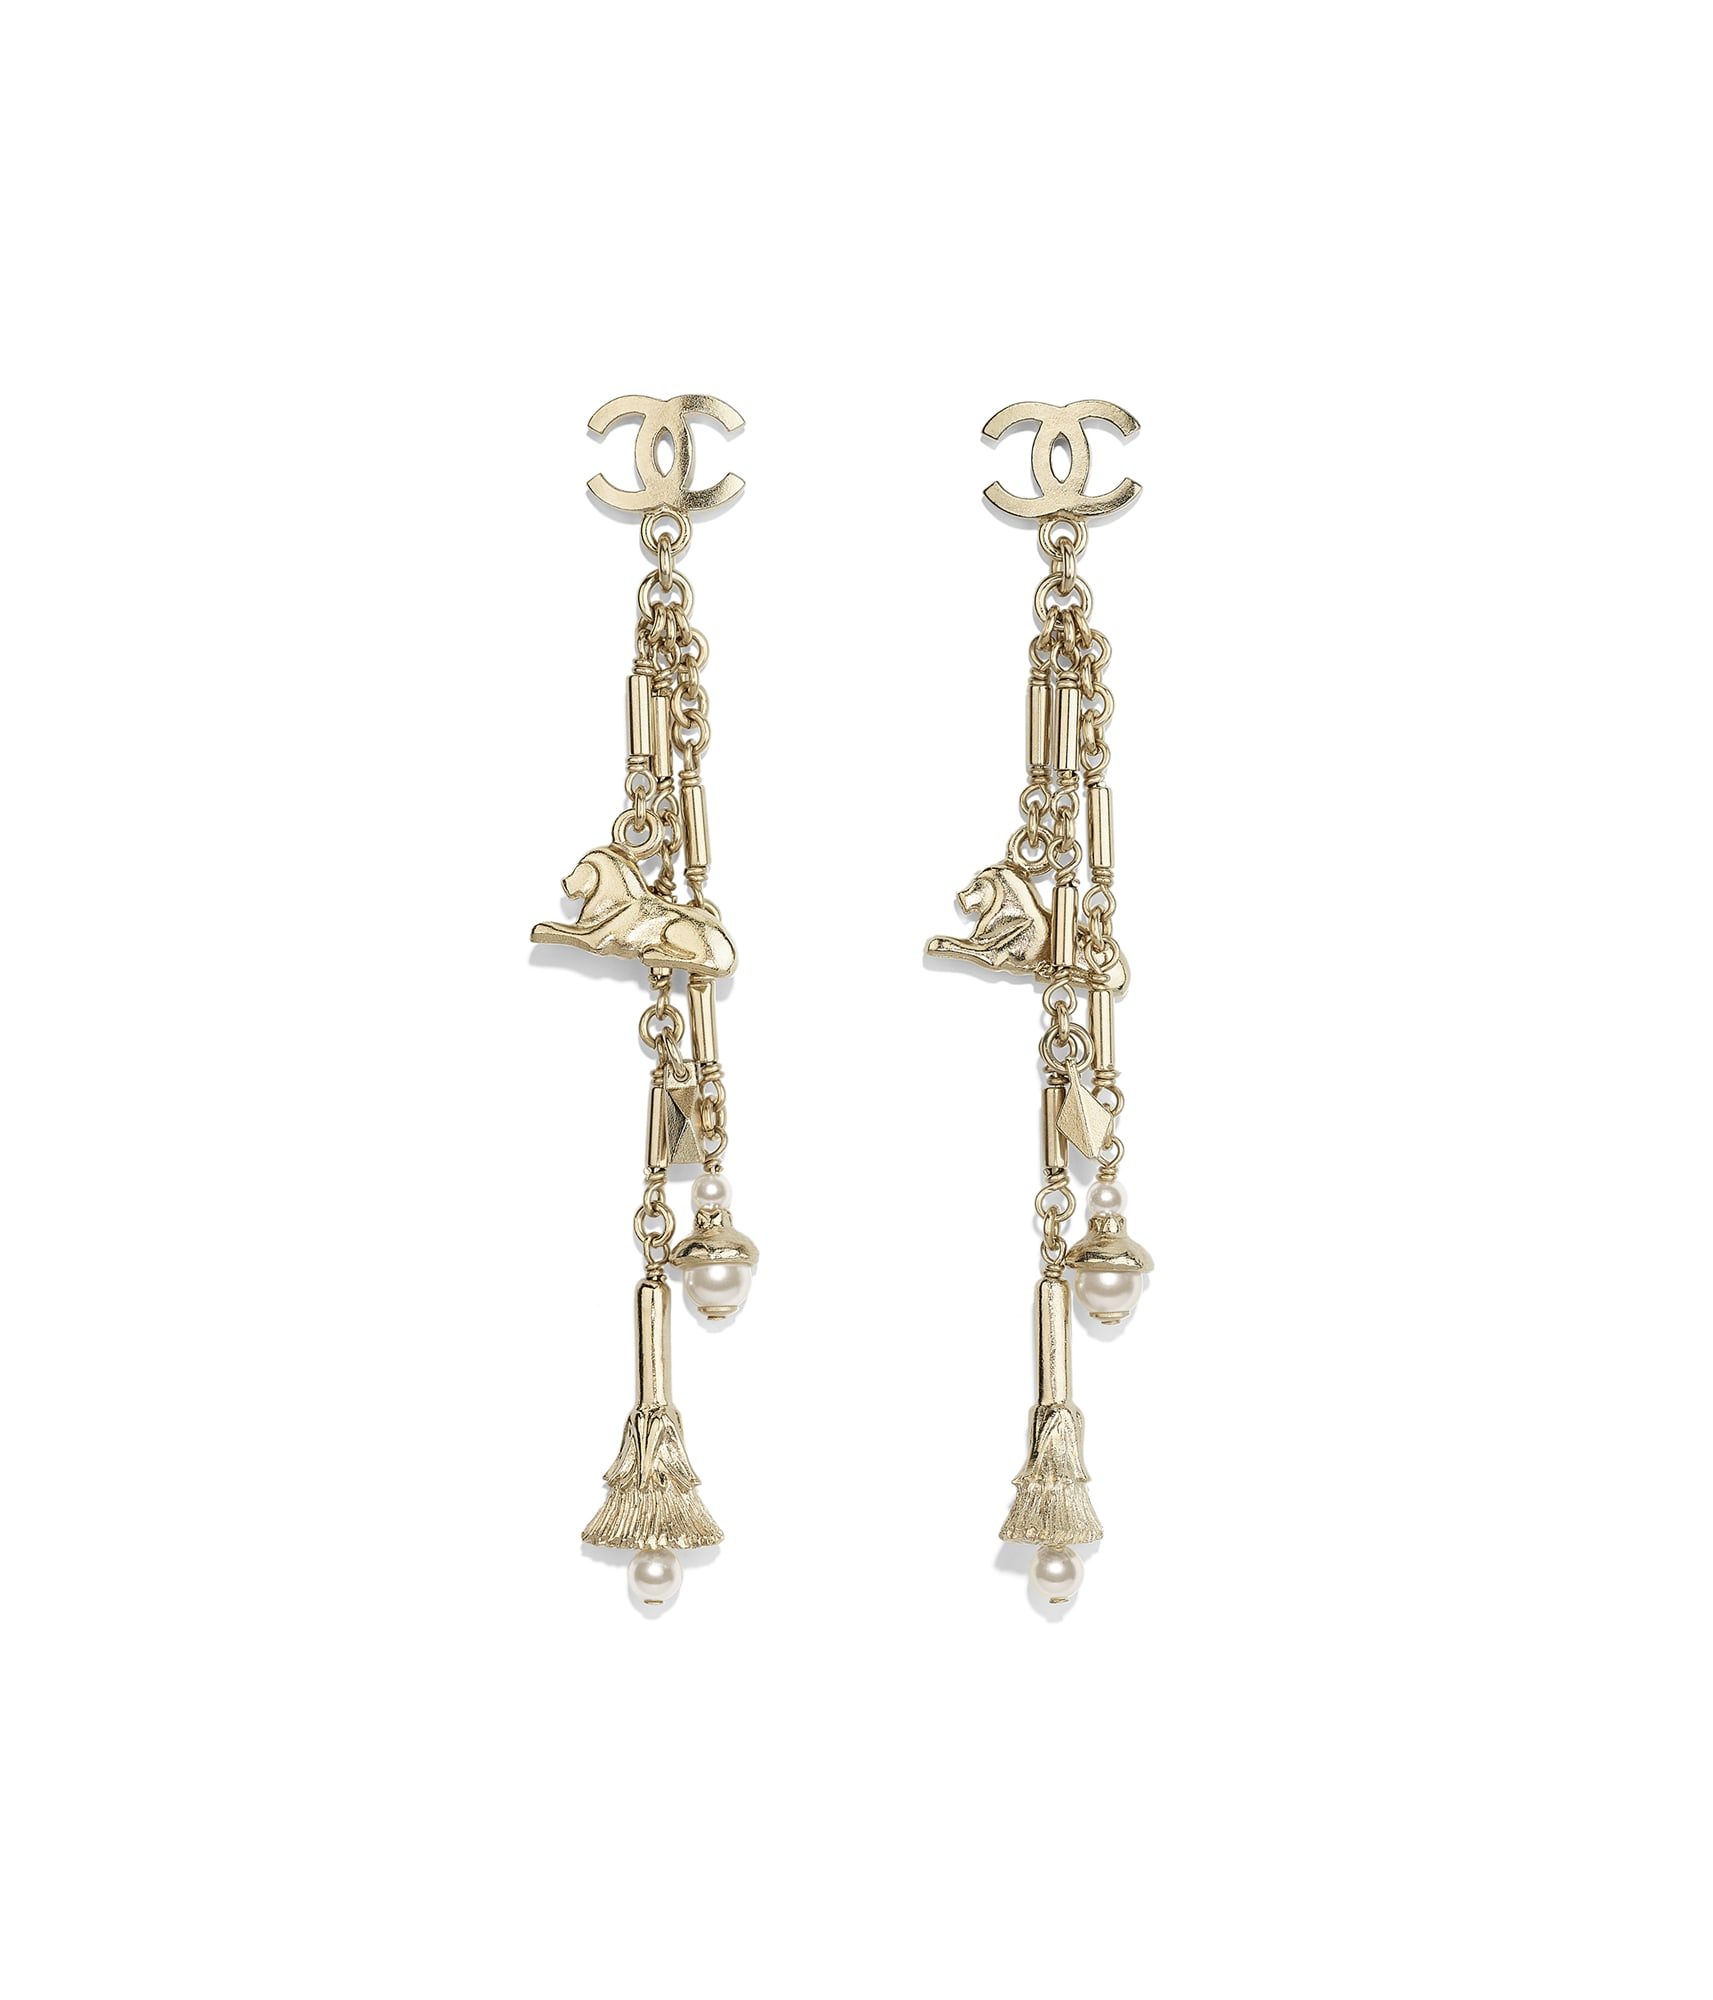 e64efd62c Earrings - Costume Jewellery - CHANEL